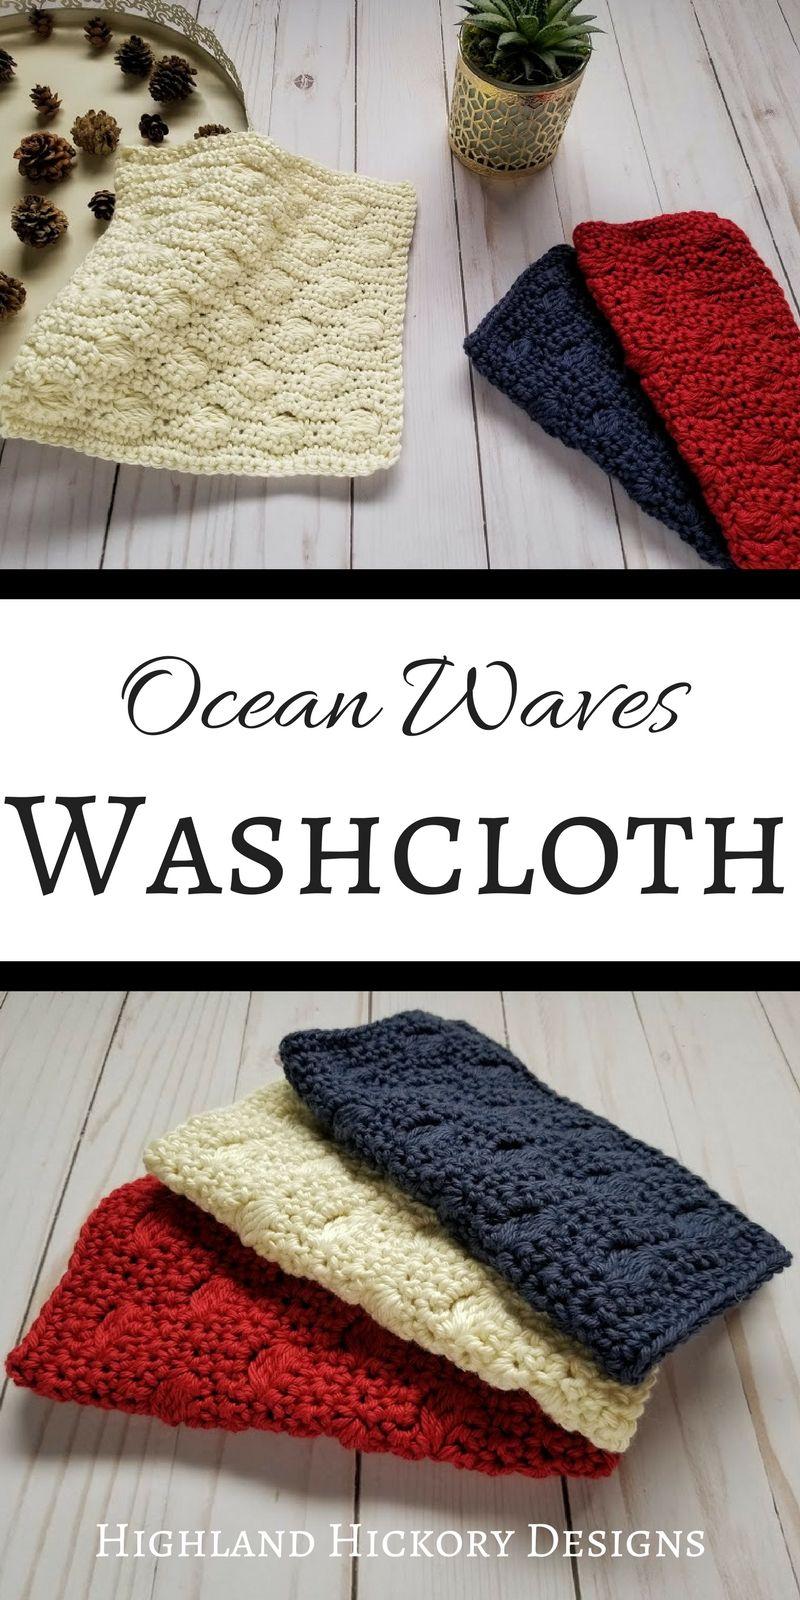 Ocean Waves Washcloth - Free Crochet Pattern - Highland Hickory ...